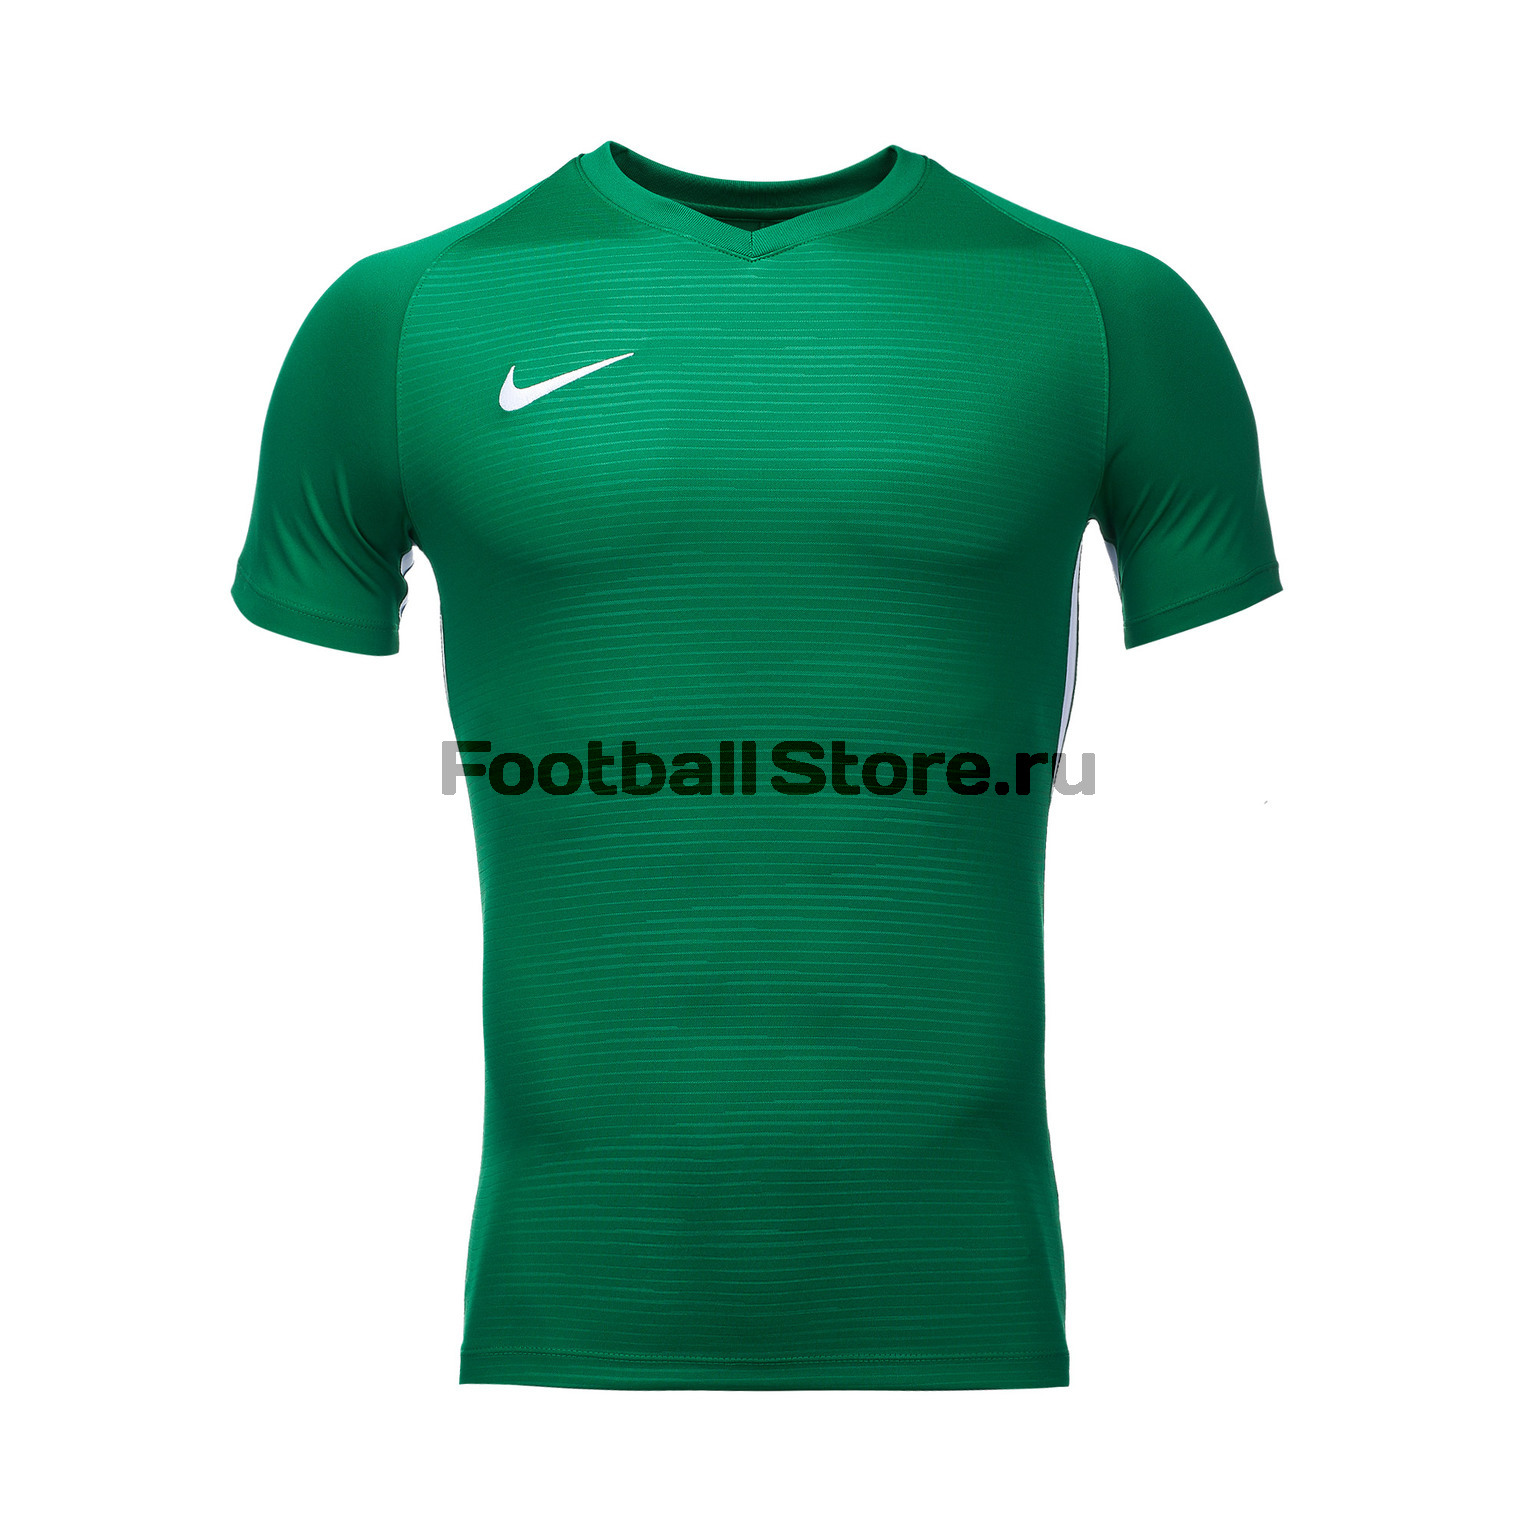 Футболка игровая Nike Dry Tiempo Prem JSY SS 894230-302 футболка игровая nike dry tiempo prem jsy ss 894230 662